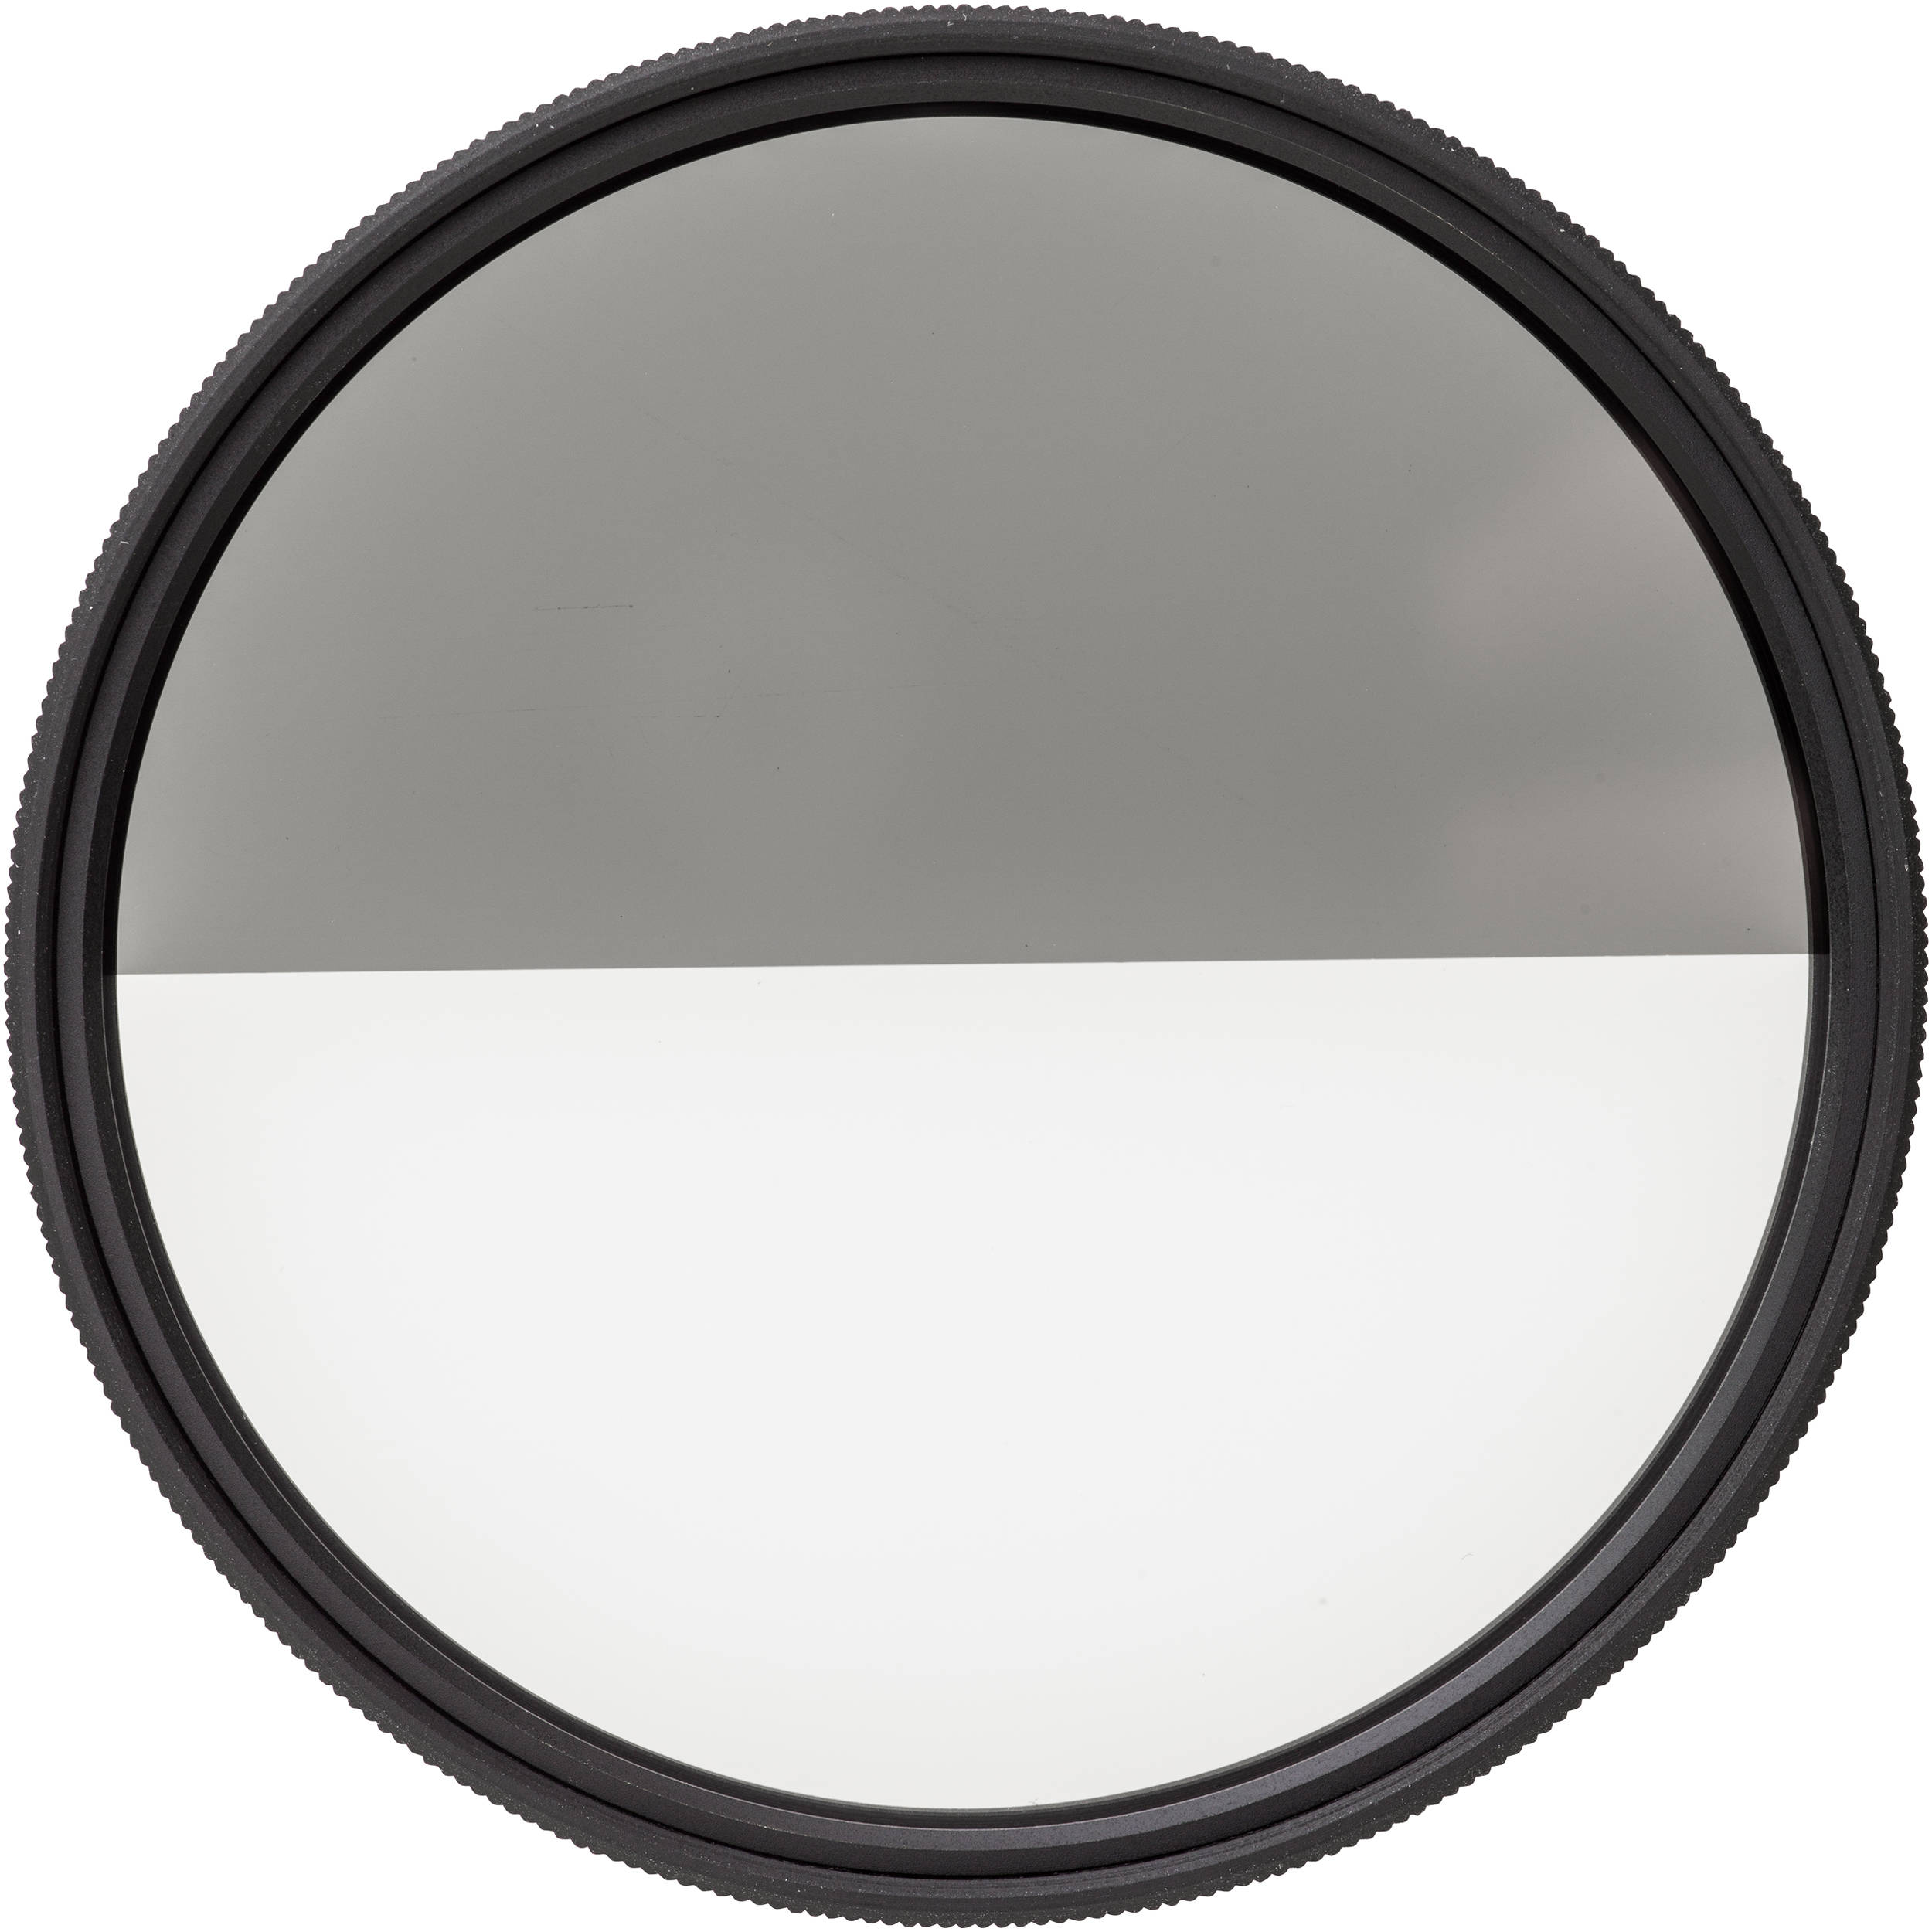 Heliopan 58mm Graduated Neutral Density 06 Filter